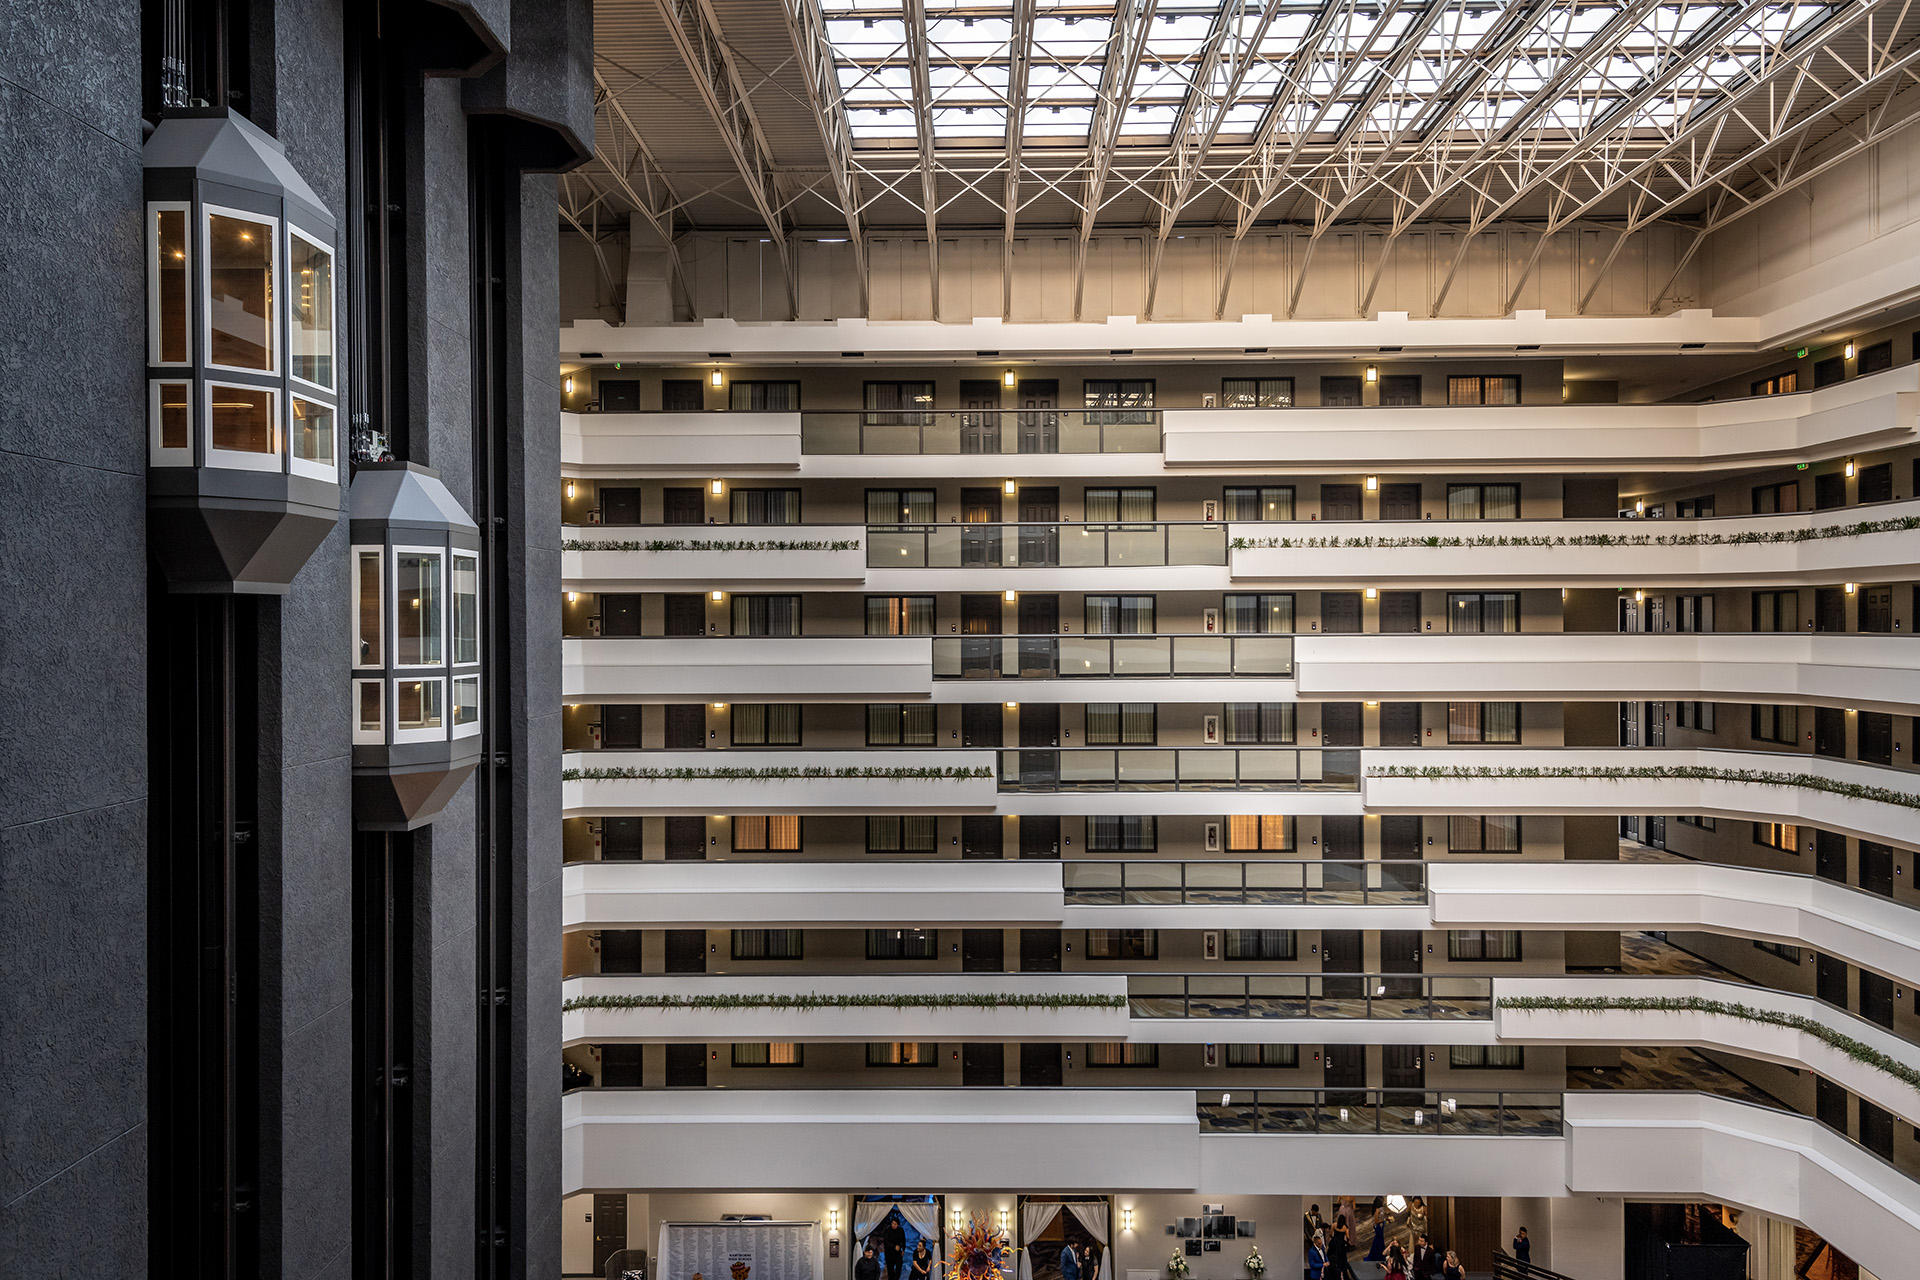 Embassy Suites by Hilton Los Angeles International Airport North Atrium and Elevators